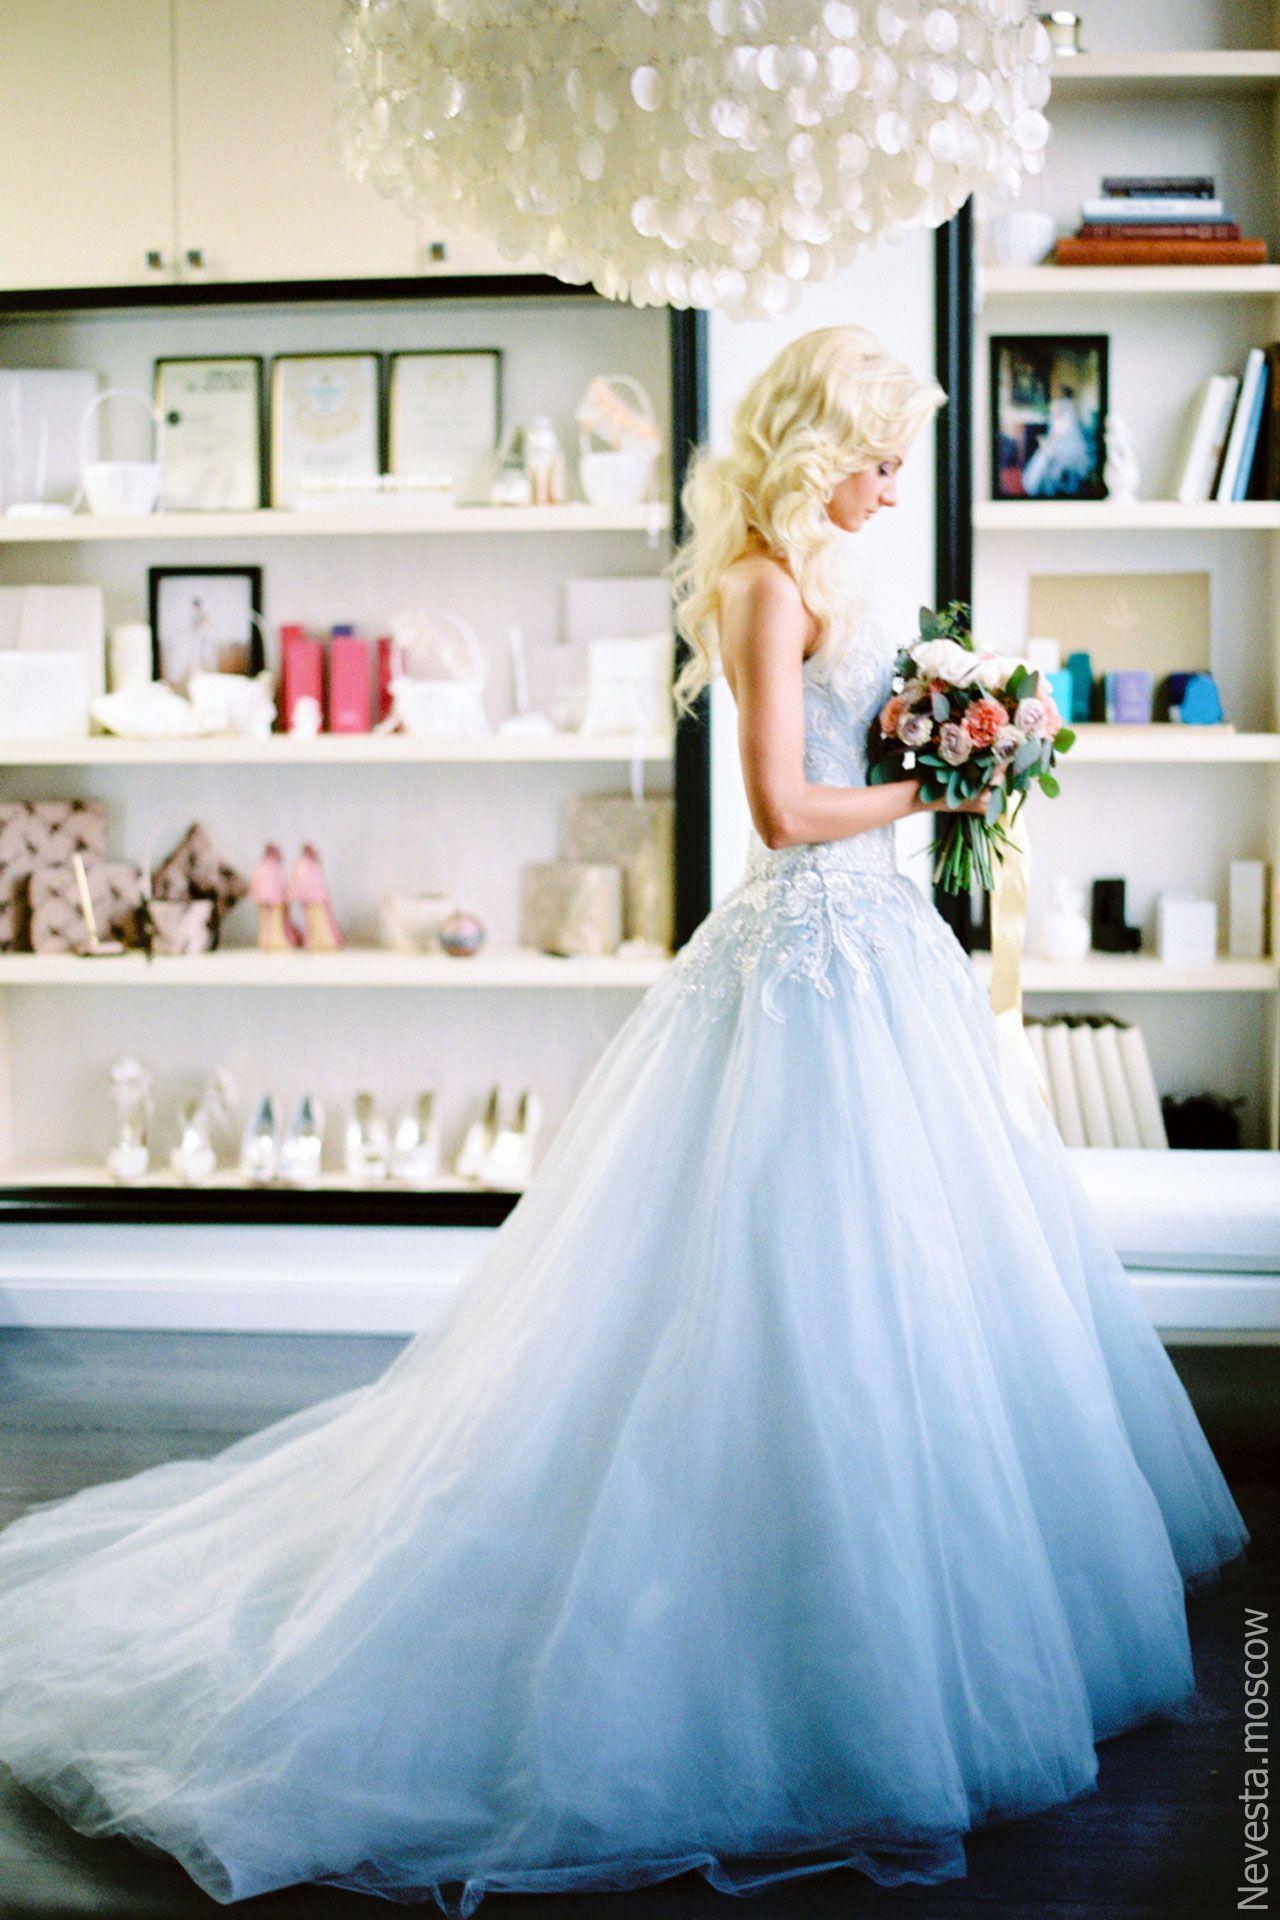 актриса Полина Максимова в свадебном платье невеста фото 5